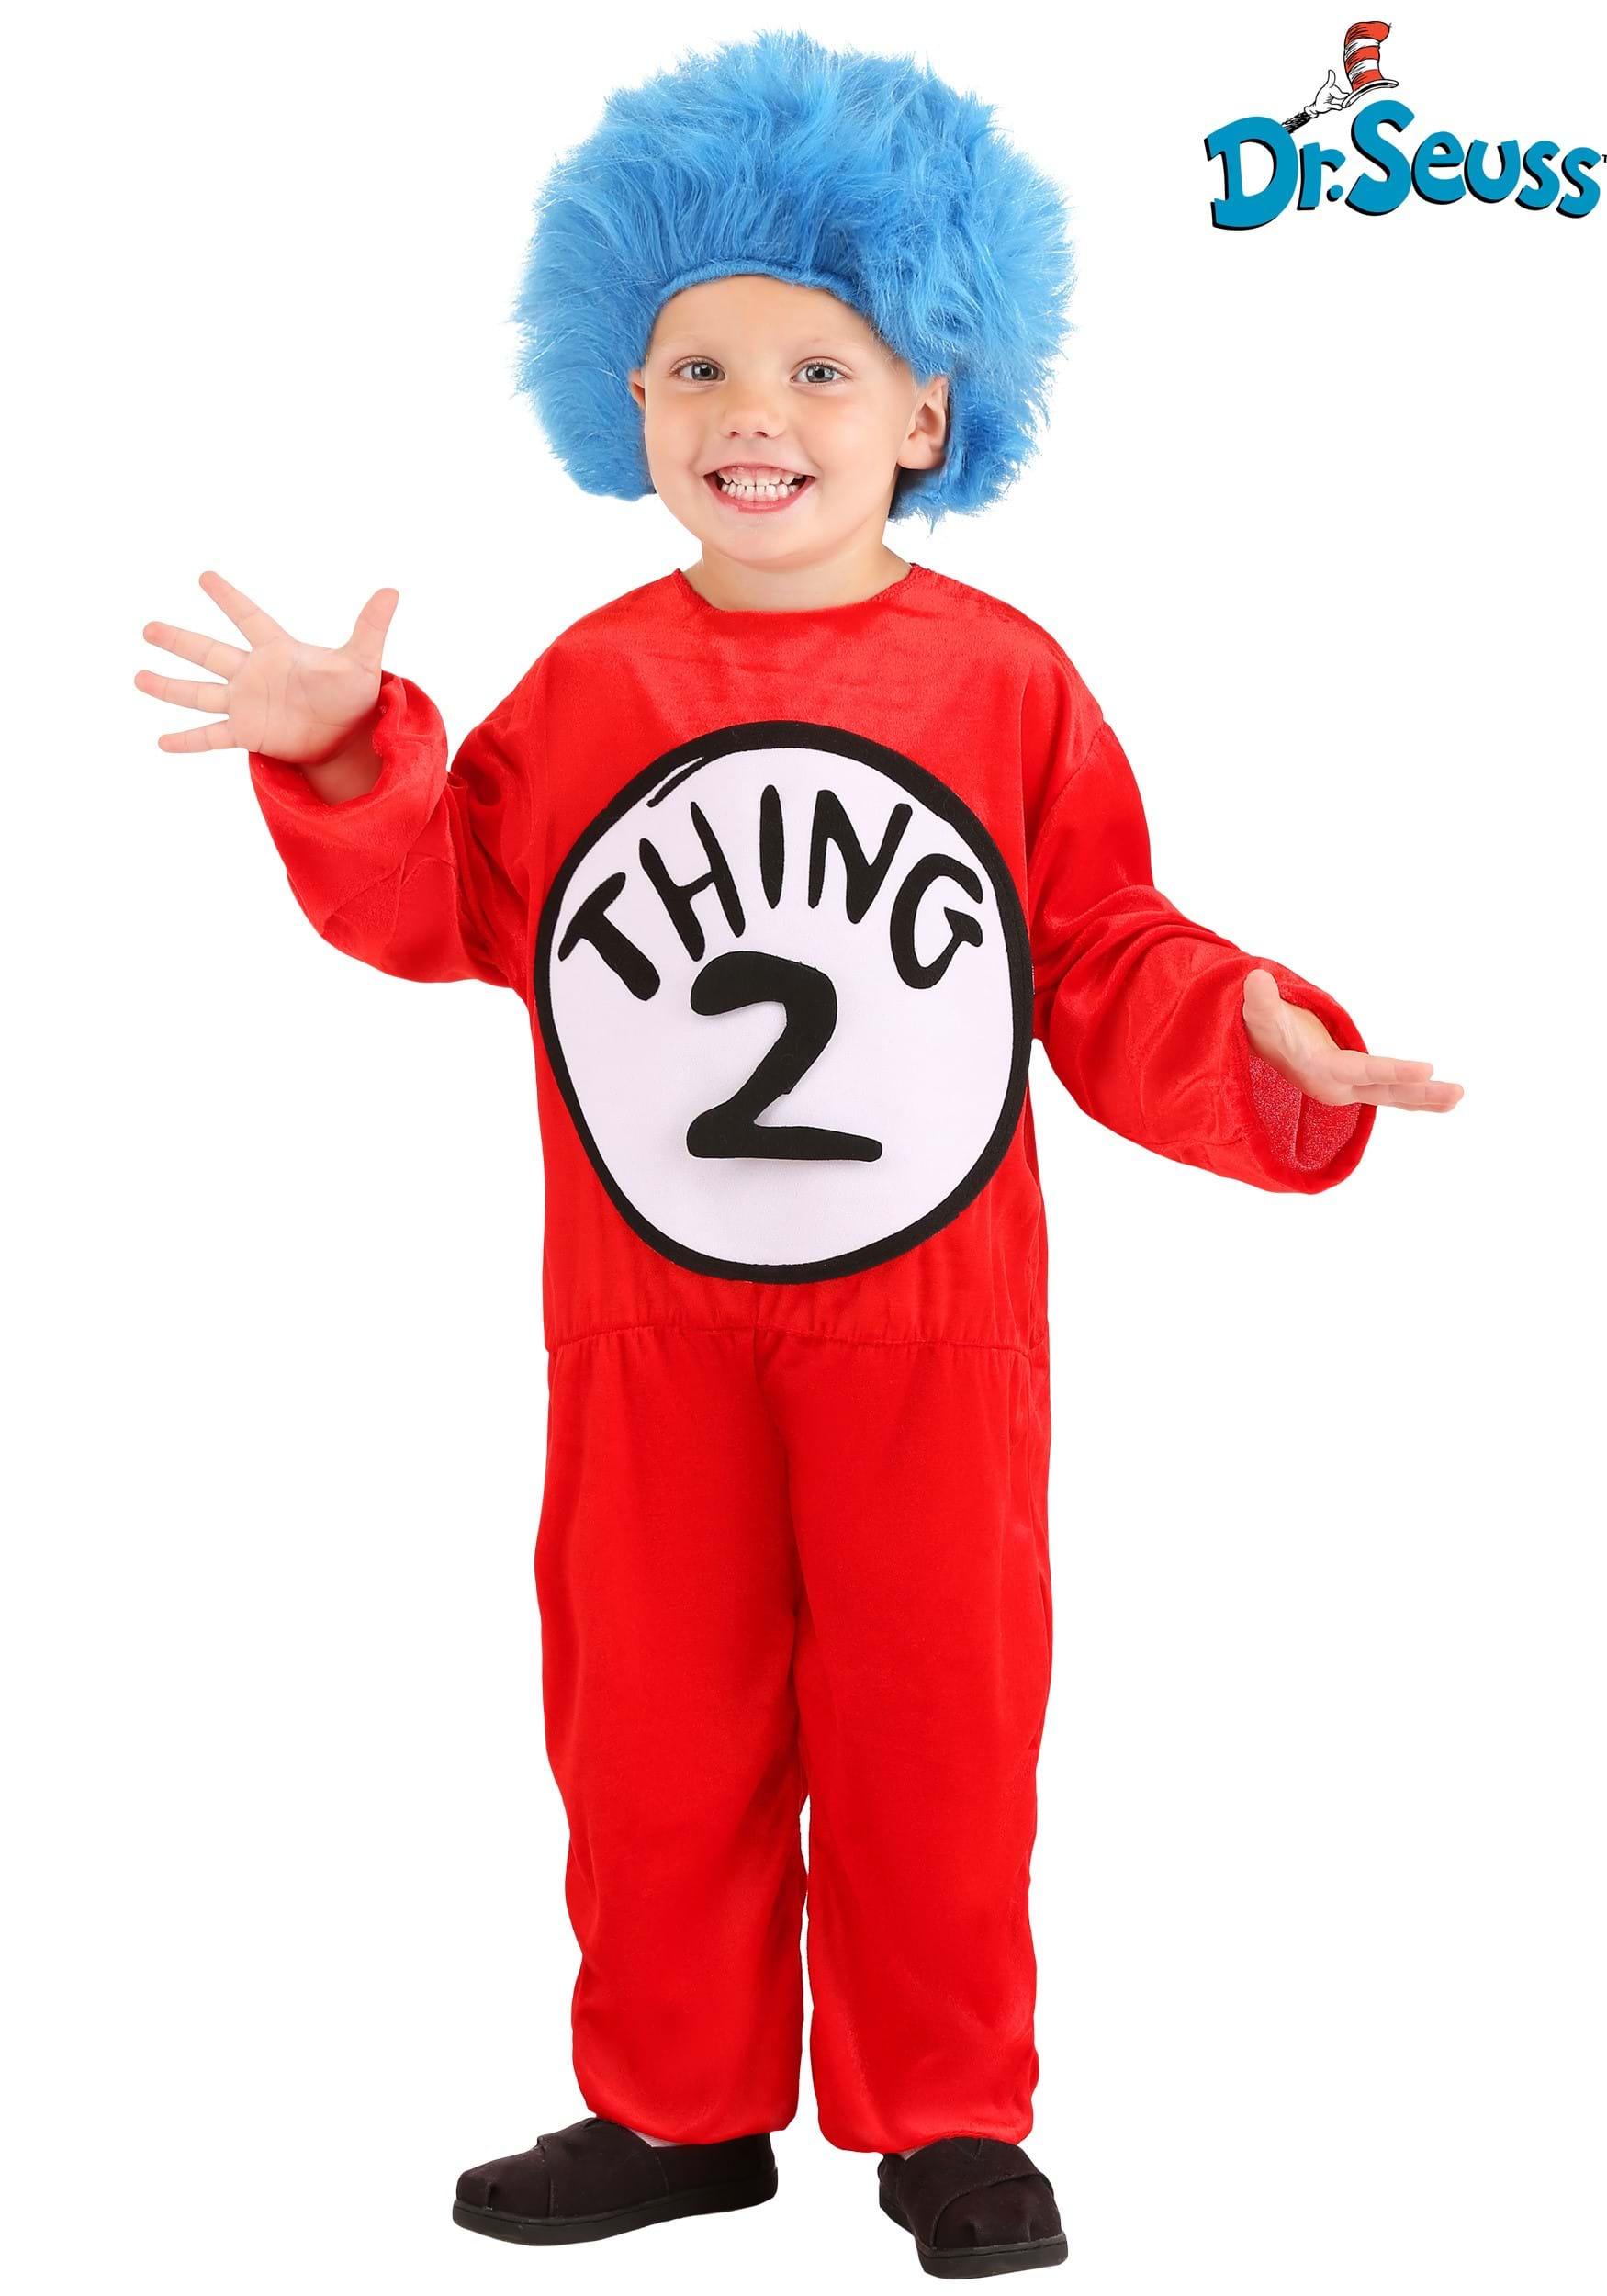 2t Halloween Costumes Boy